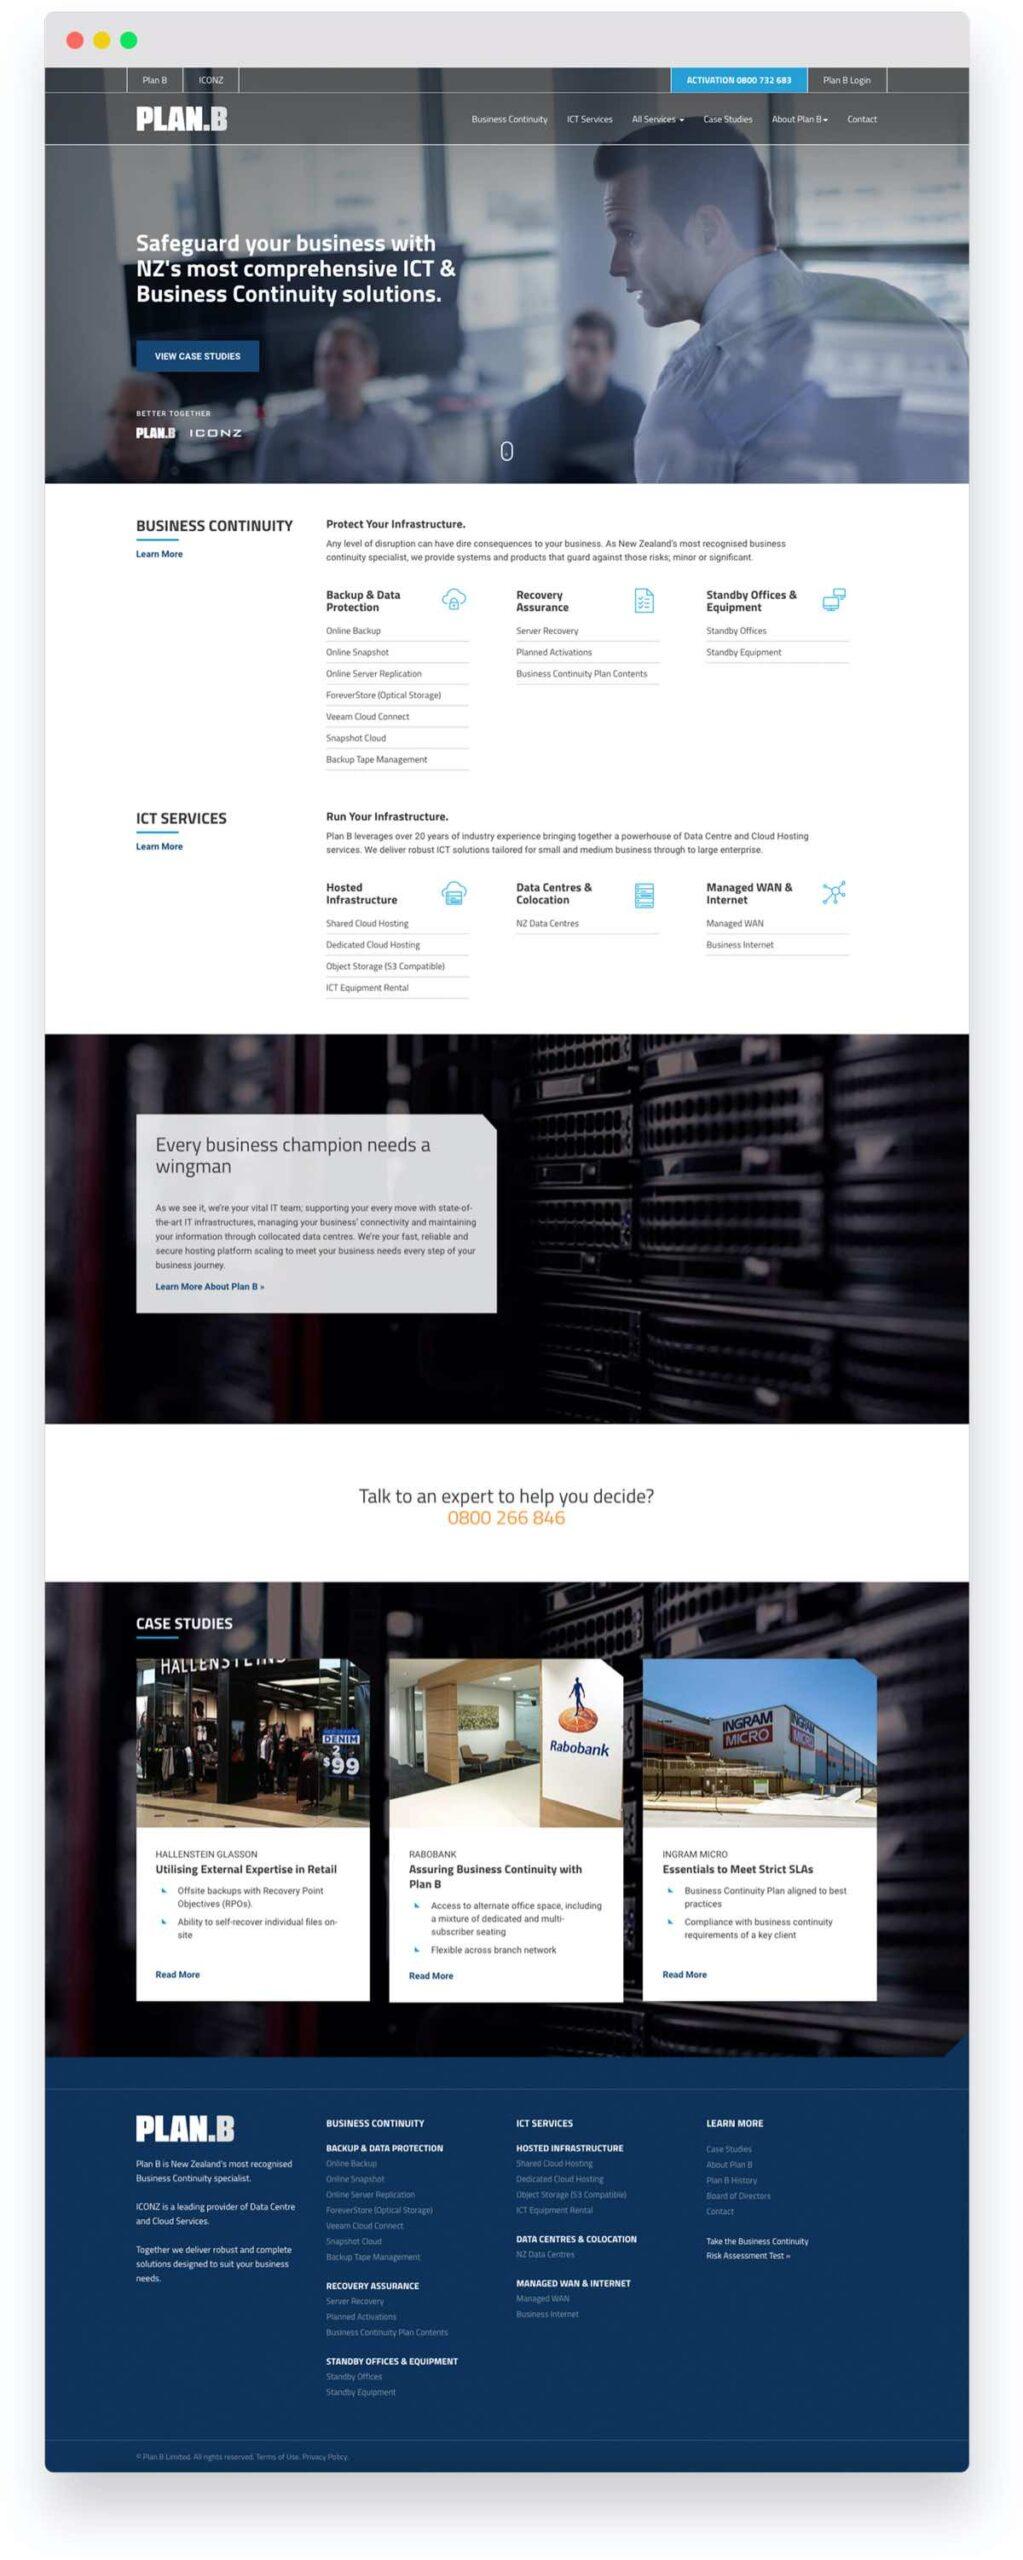 Plan B B2B Website Marketing